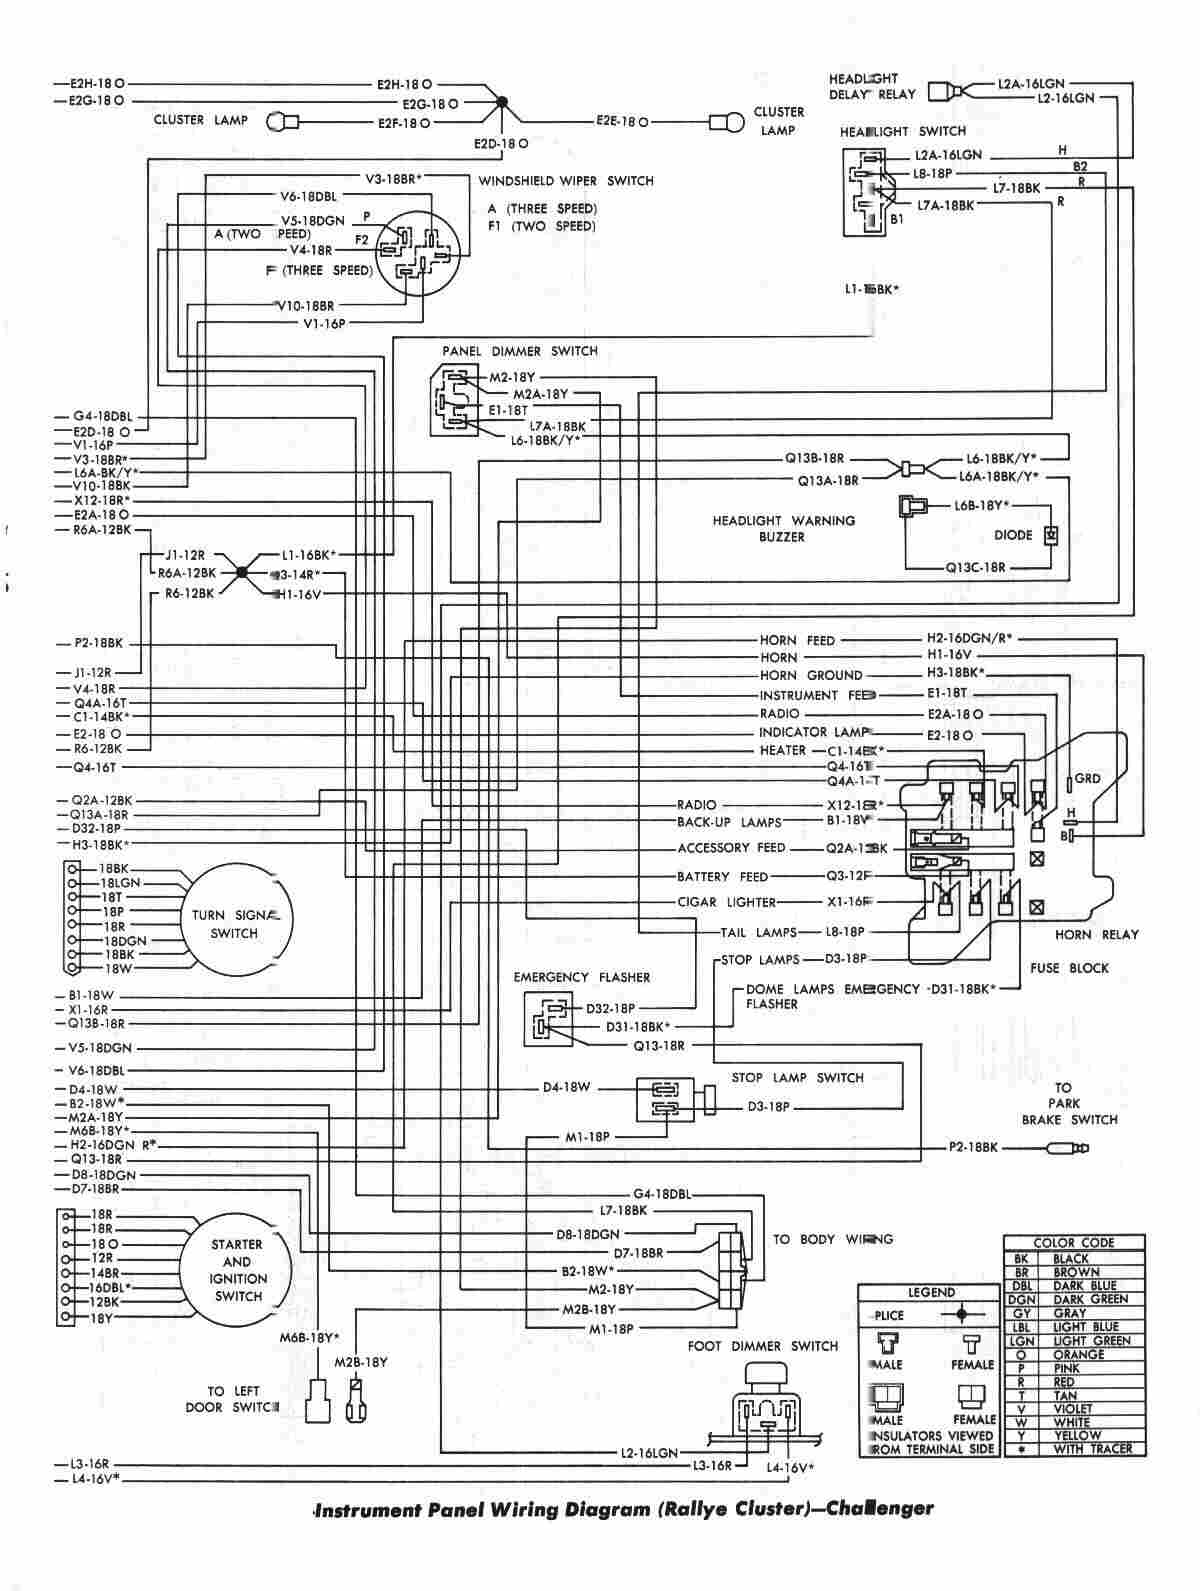 Dodge+Challenger+1970+Instrument+Panel+Wiring+Diagram+(Rallye+Cluster) honeywell rth7600d wiring diagram roslonek net,Honeywell Thermostat Rth7600d Wiring